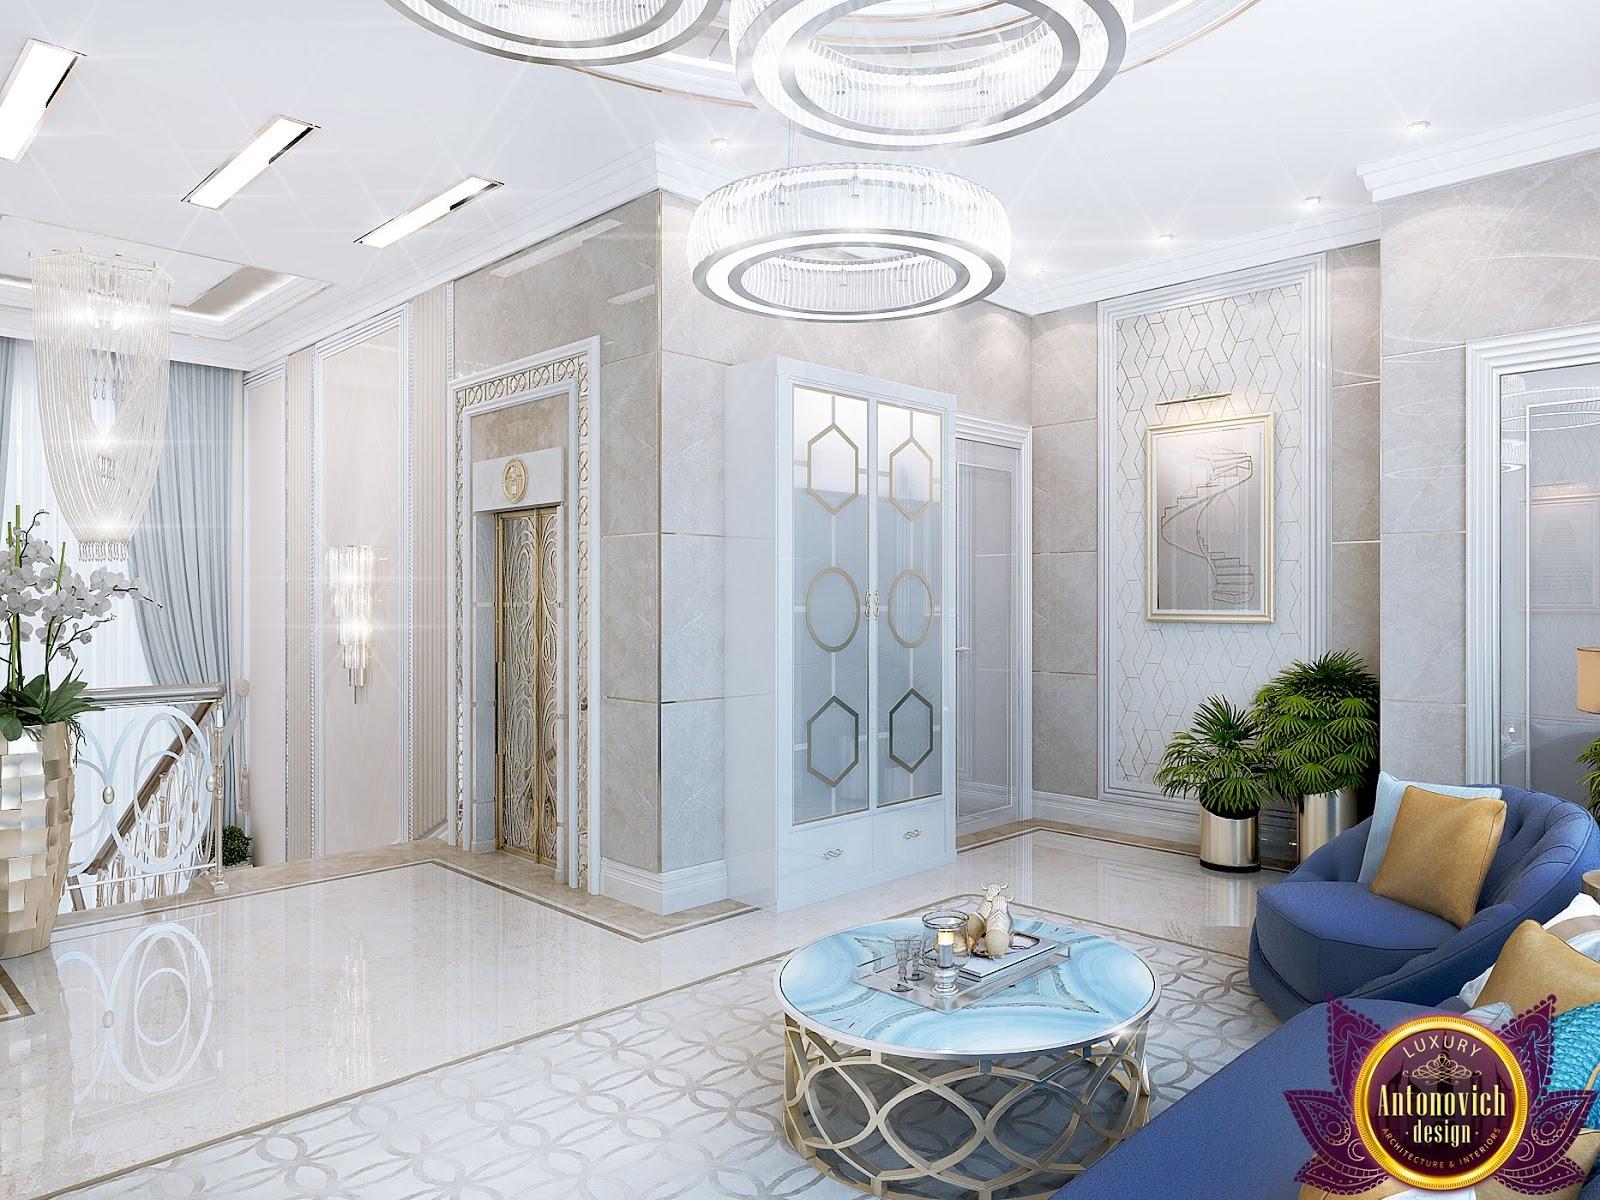 Kitchen Design Usa By Katrina Antonovich: Kenyadesign: Luxury In Contemporary Style Of Katrina